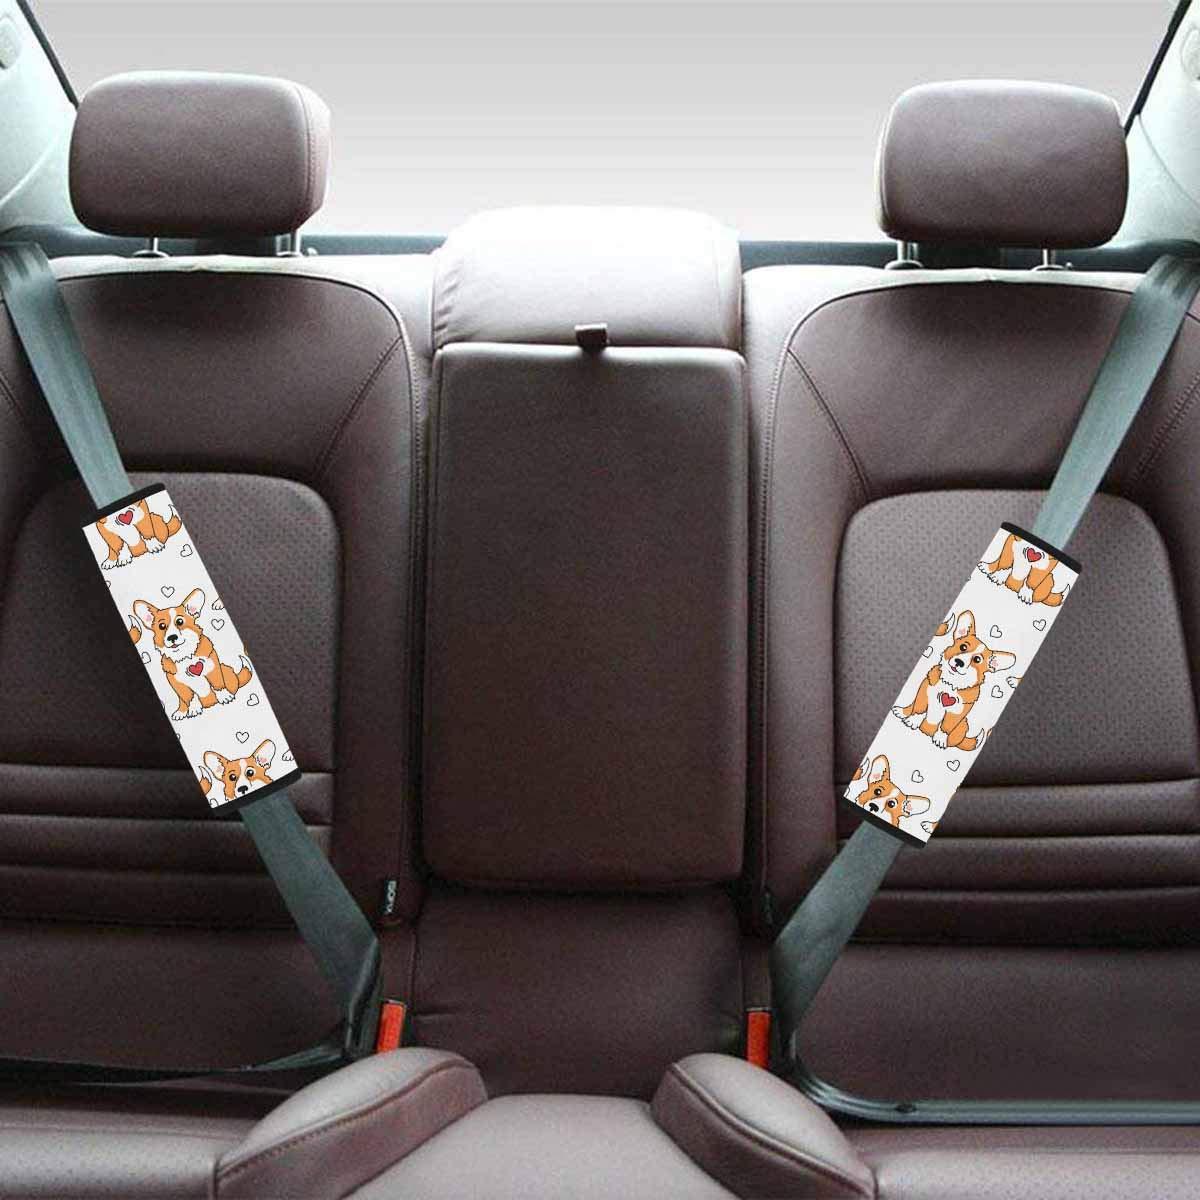 INTERESTPRINT Auto Seat Belt Covers Shoulder Seatbelt Pads for Adults 2 Packs